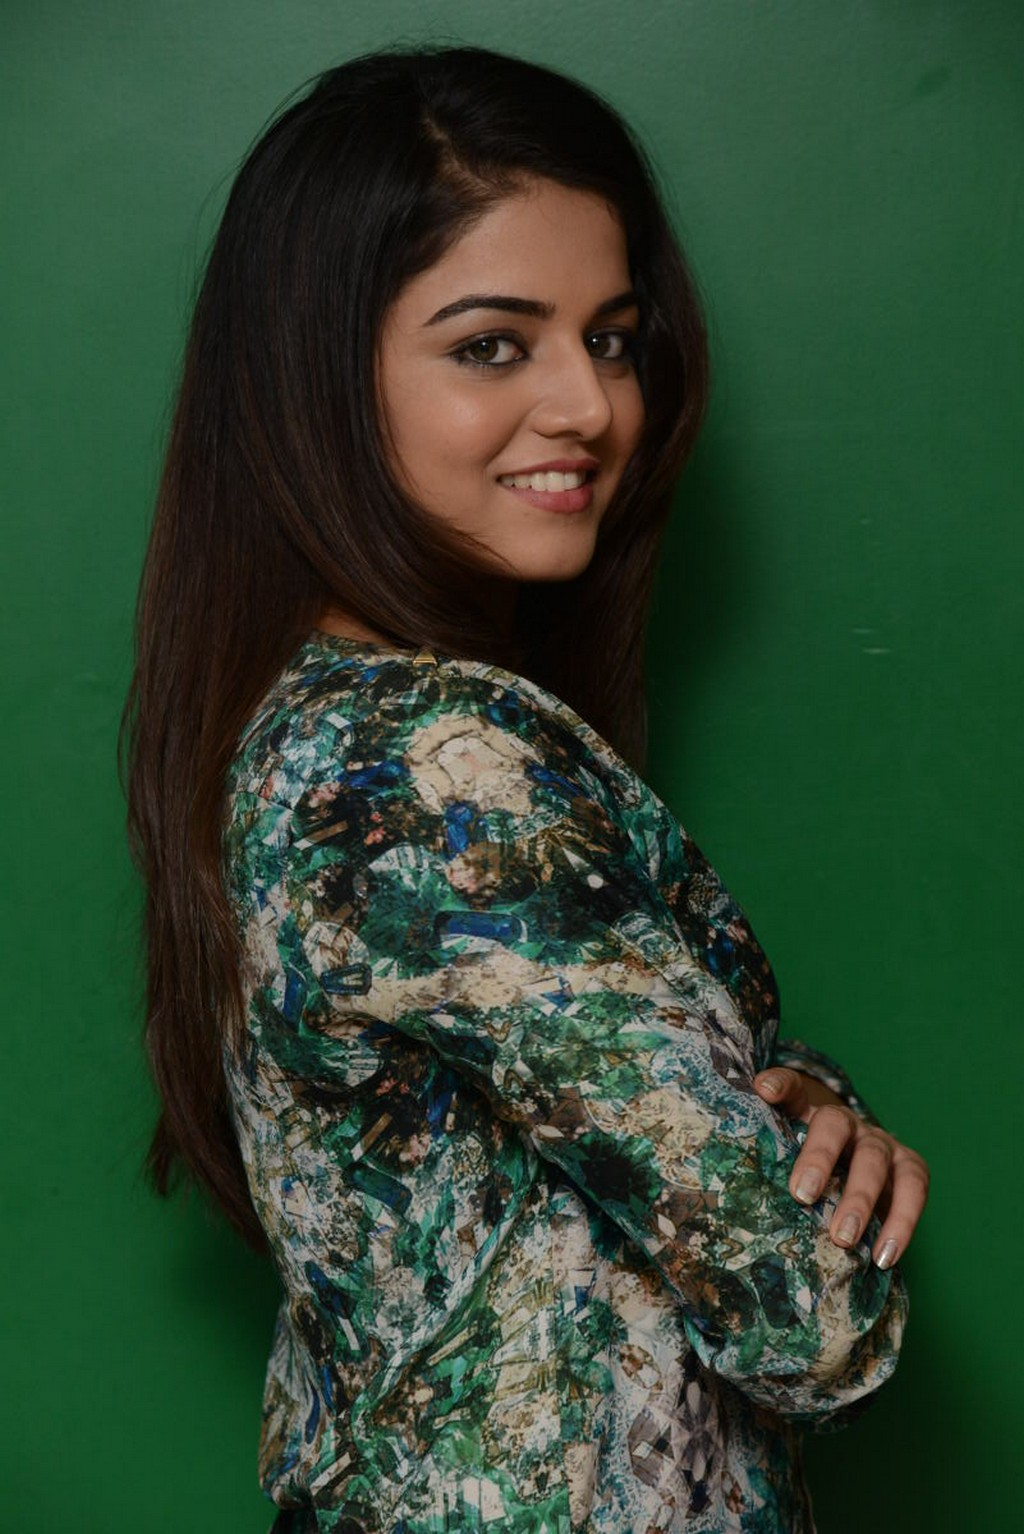 Glamours Actress Wamiqa Gabbi Hot Stills In Green Top Jeans